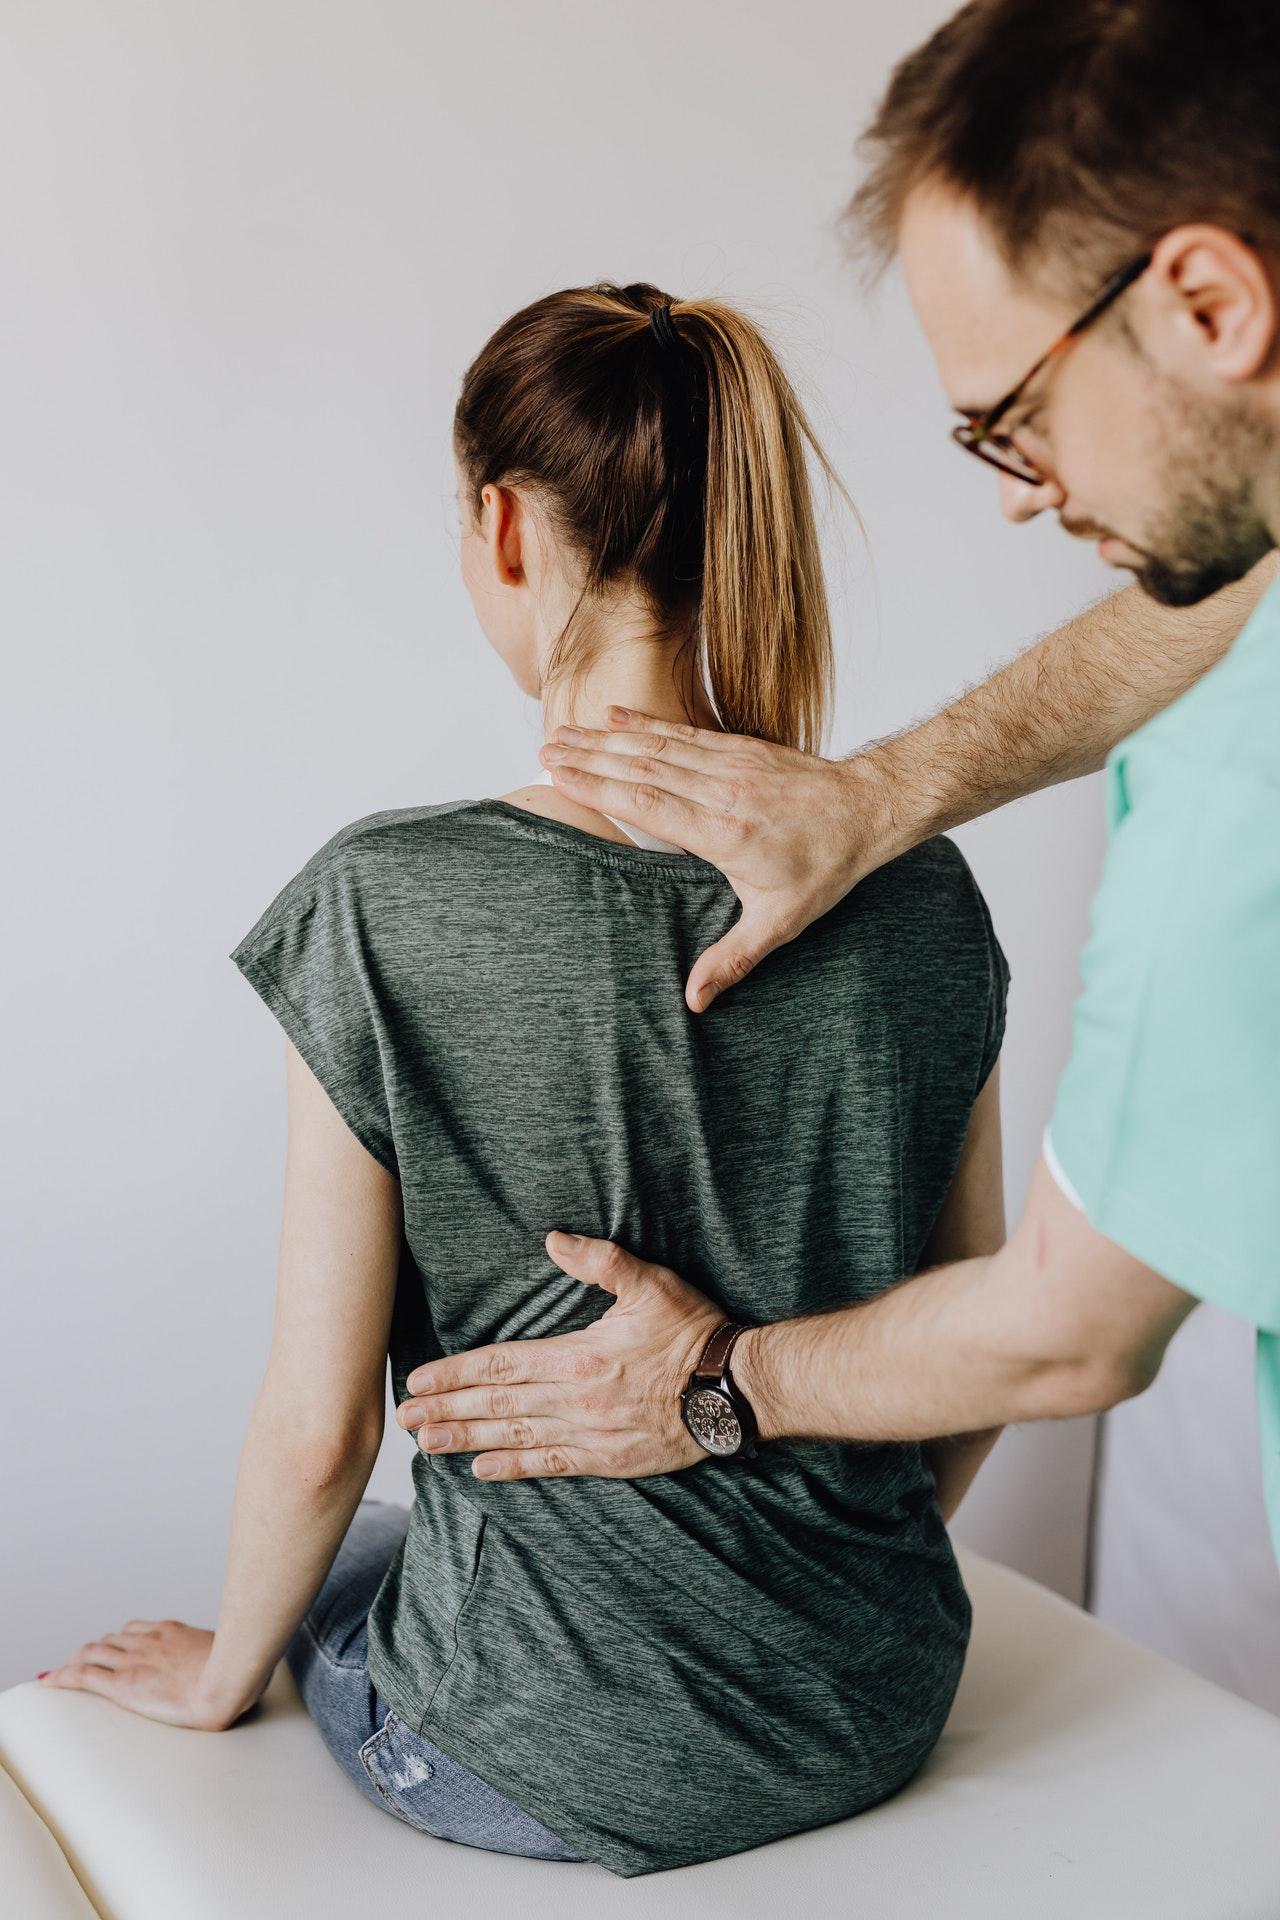 Spinal Stenosis 101